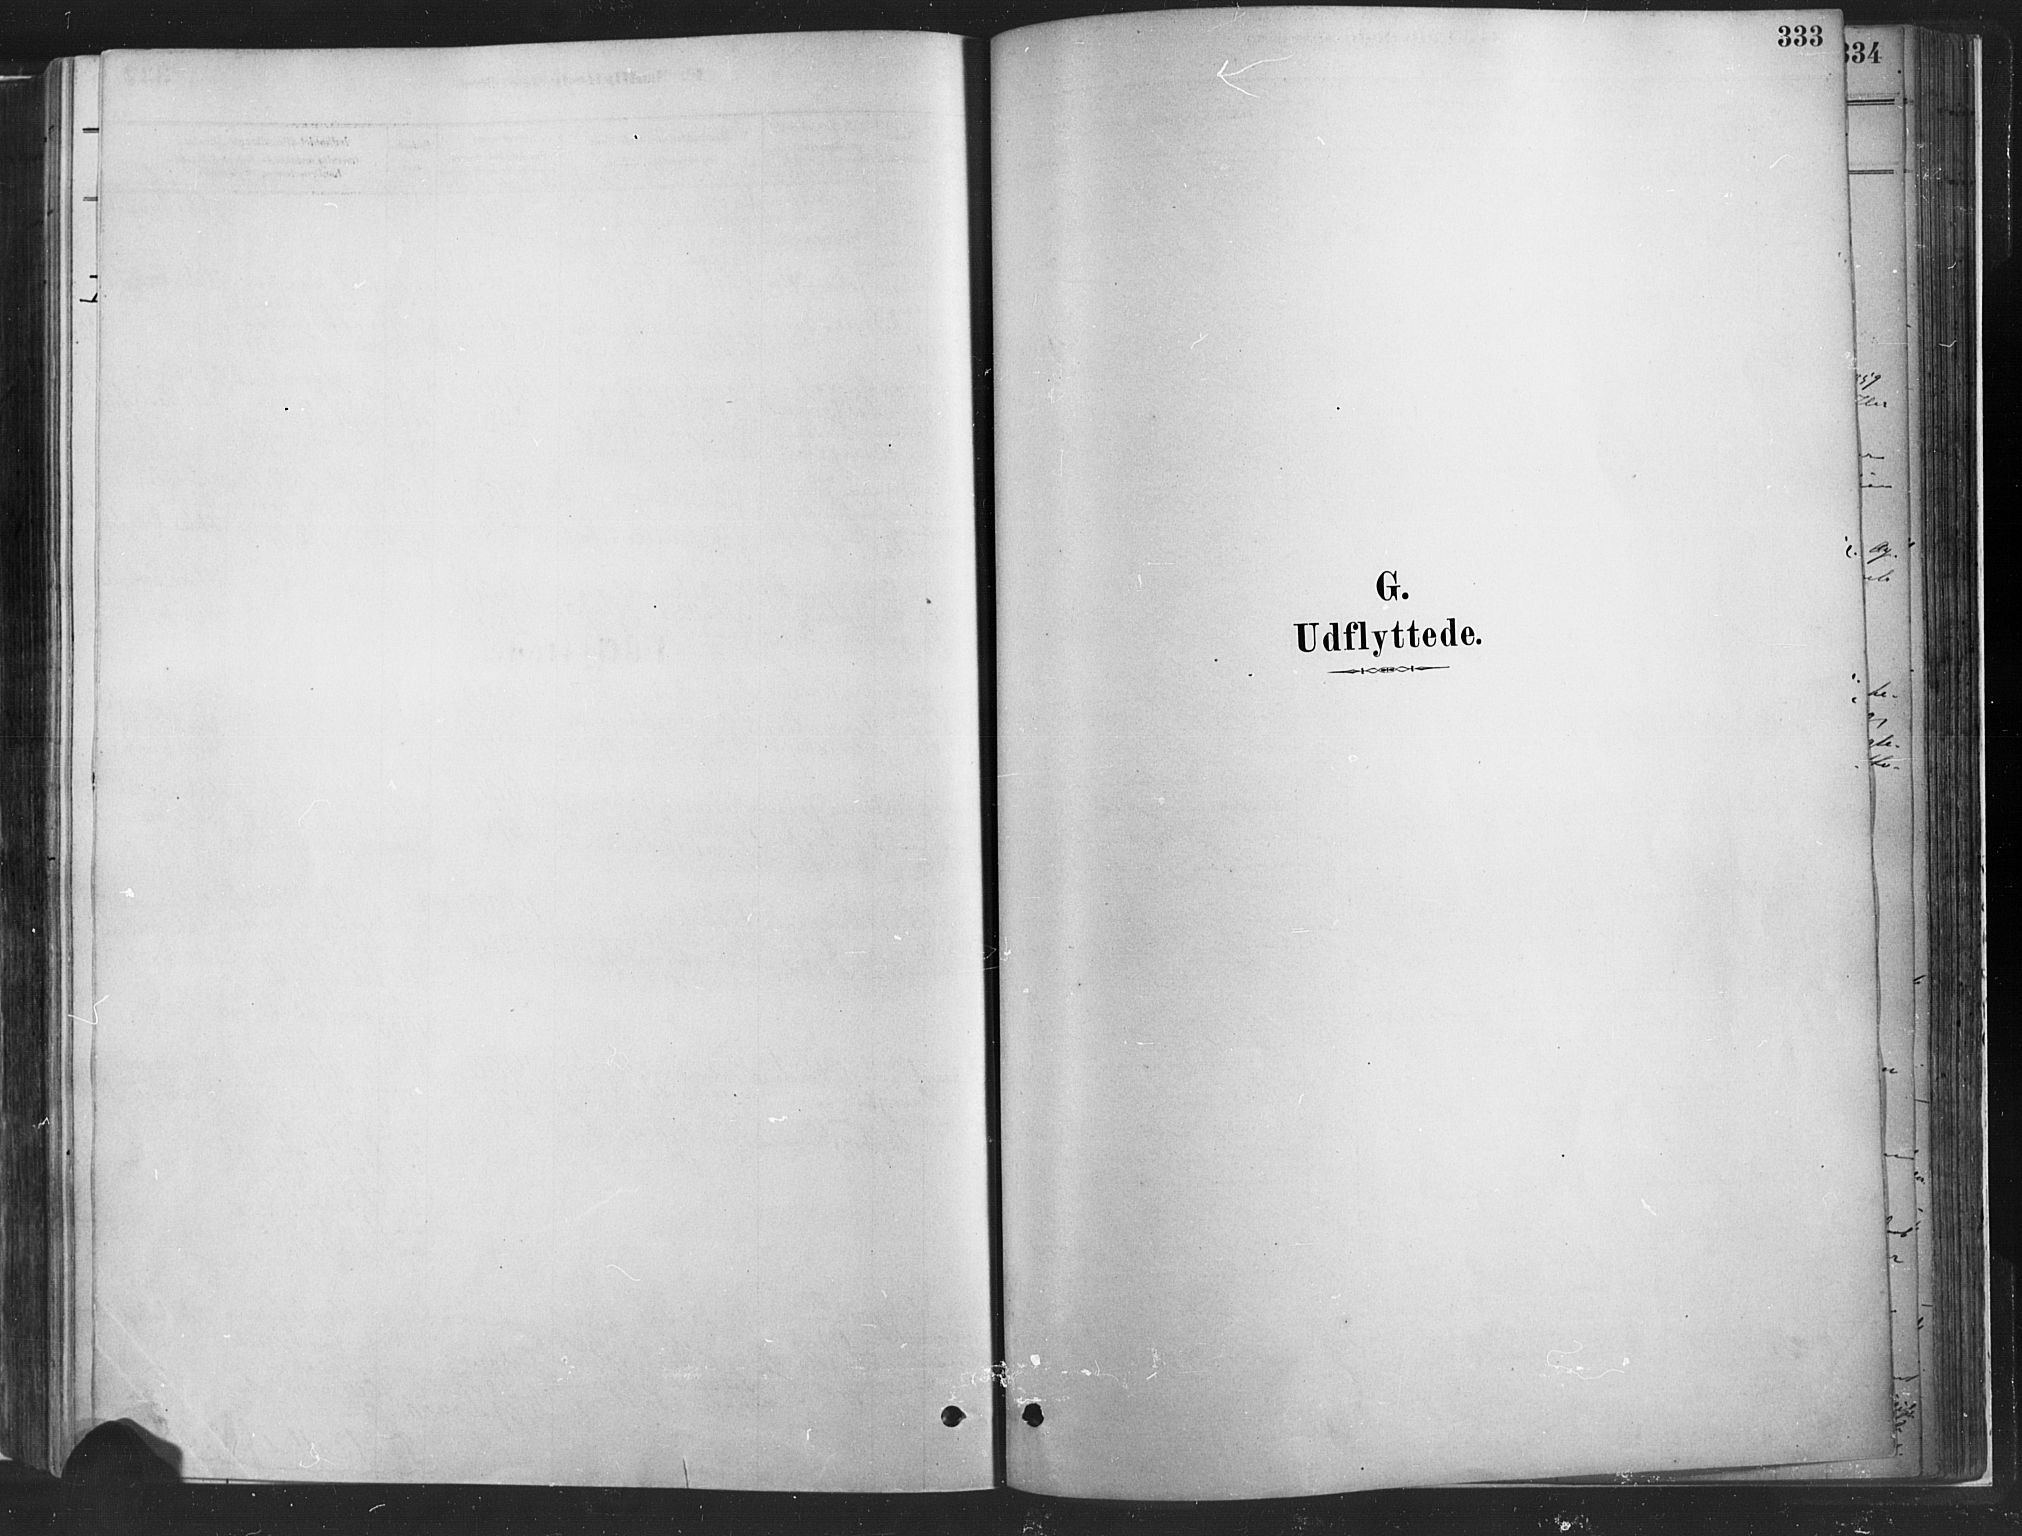 SAH, Fåberg prestekontor, H/Ha/Haa/L0010: Parish register (official) no. 10, 1879-1900, p. 333